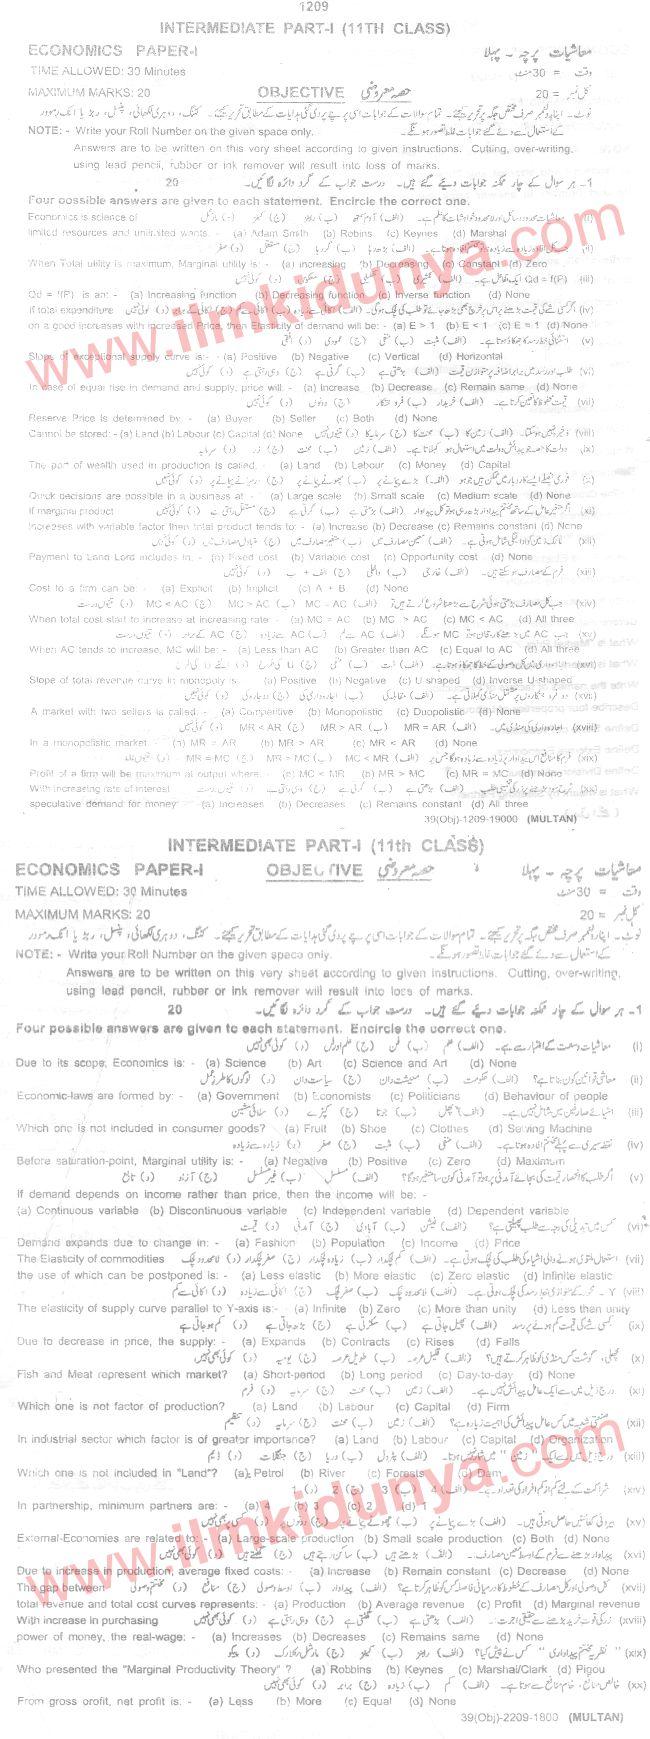 Past Papers 2009 Multan Board Inter Part 1 Economics Objective